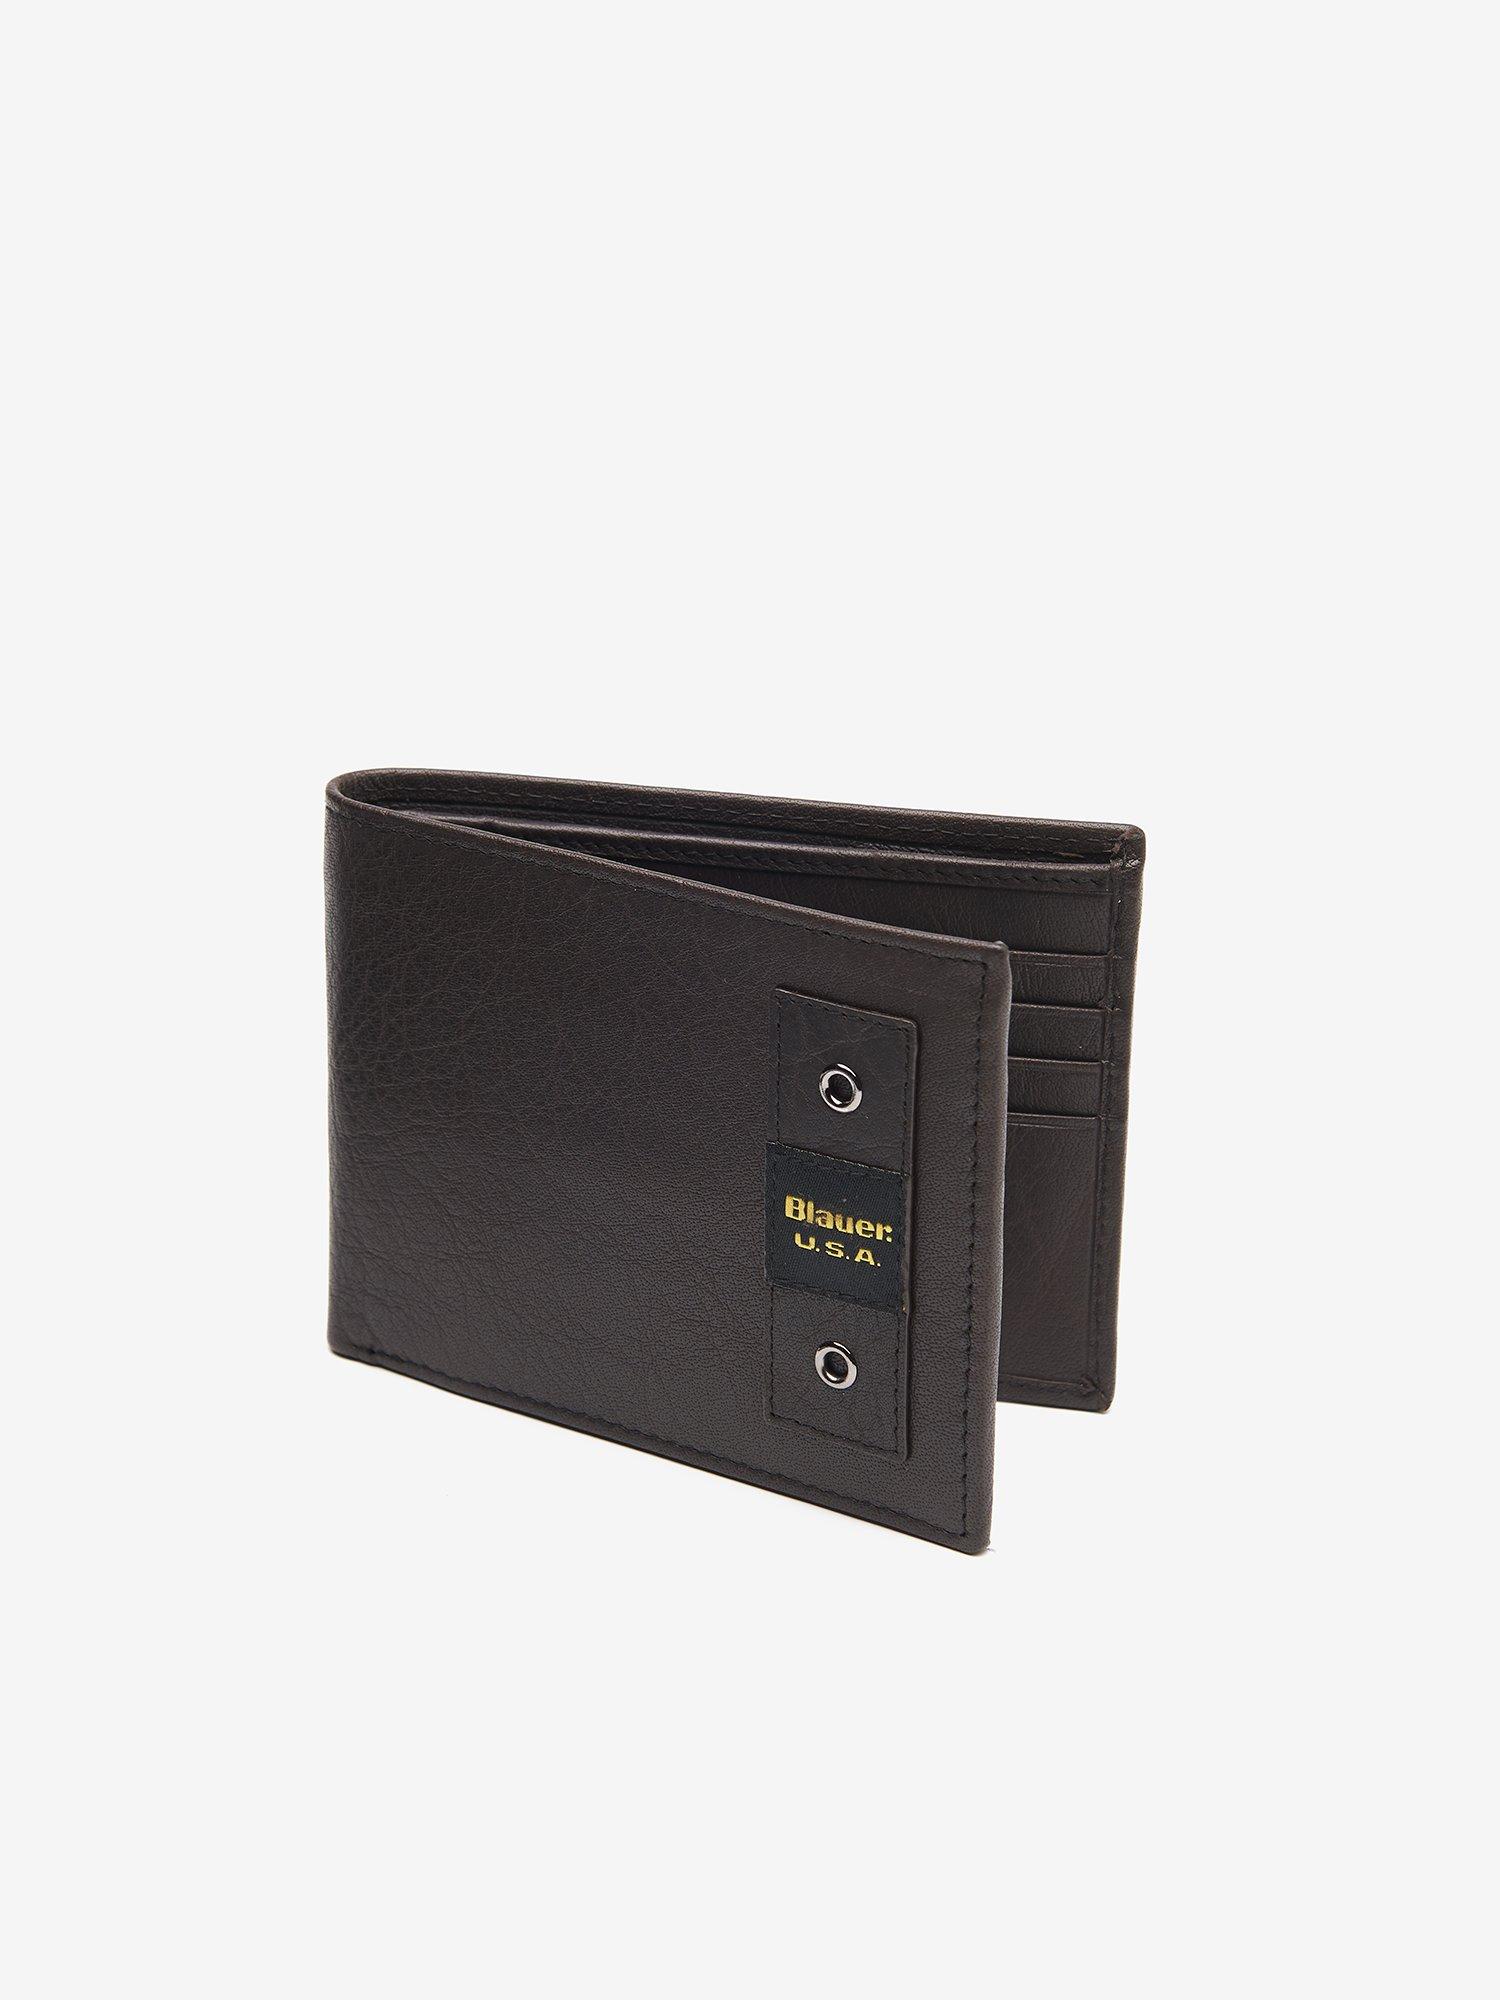 ARMOR CREDIT CARD HOLDER - Blauer